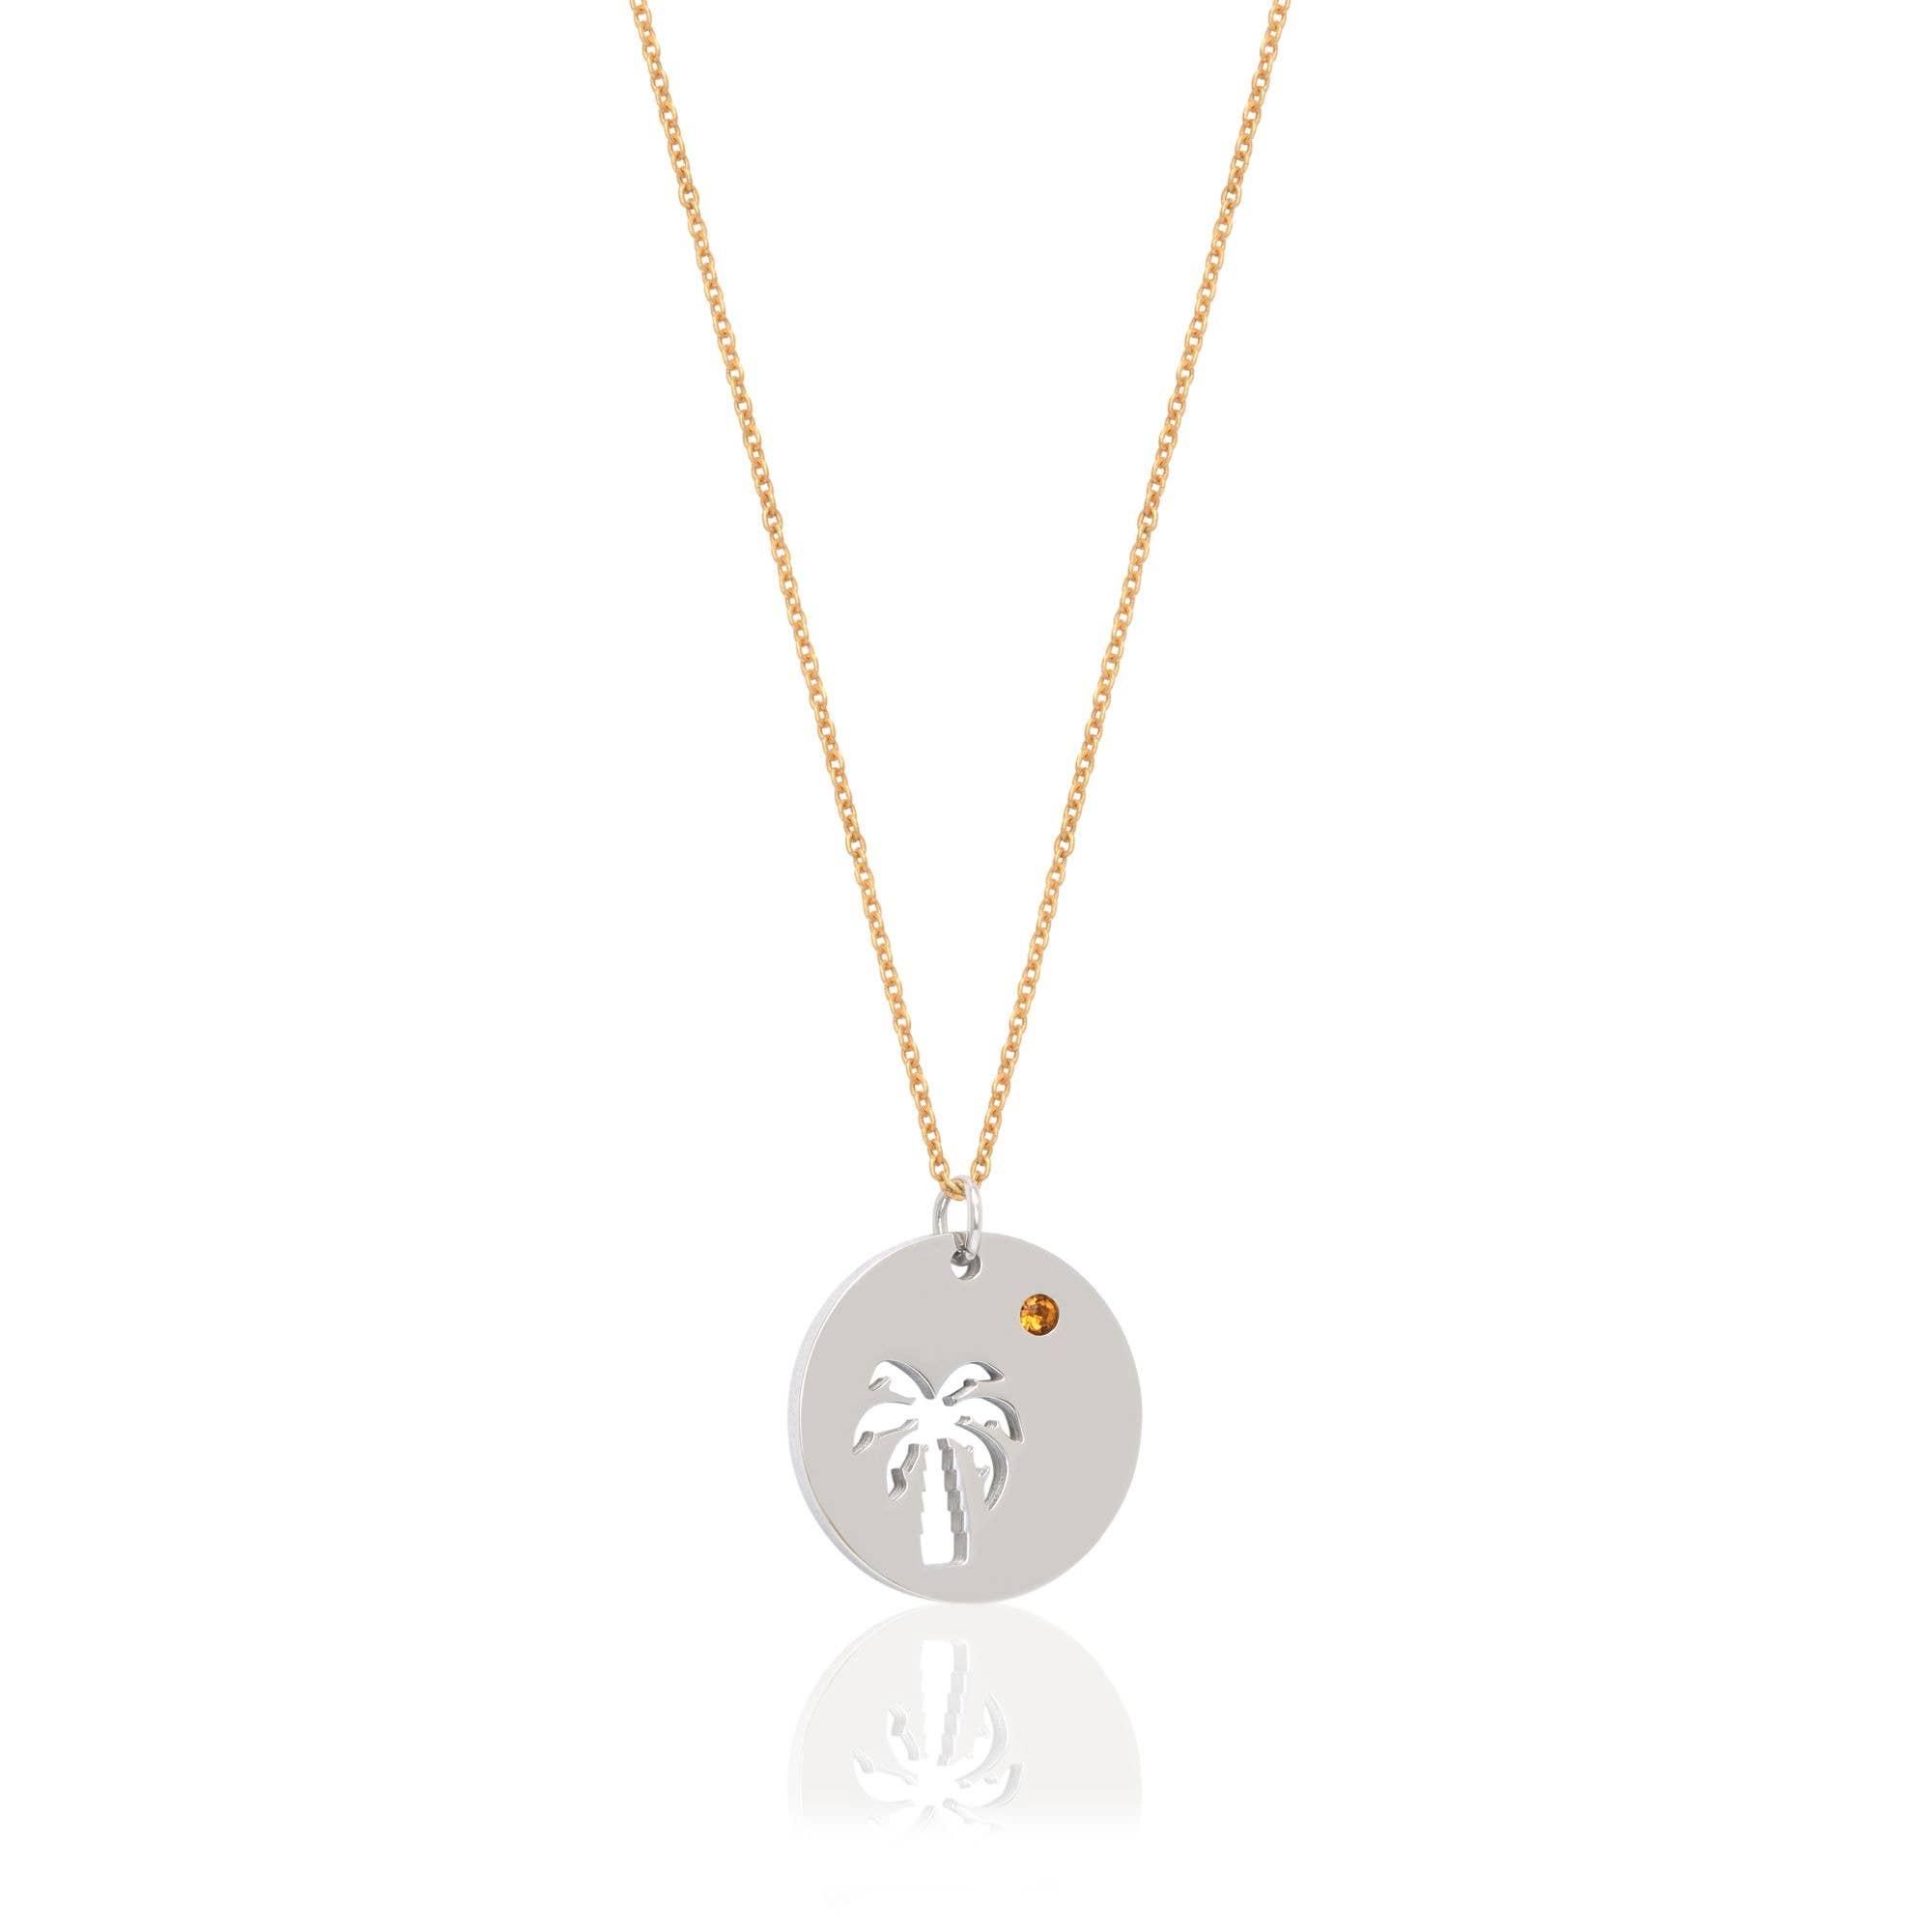 Esa Evans - Palm Tree Pendant Necklace  Yellow Stone